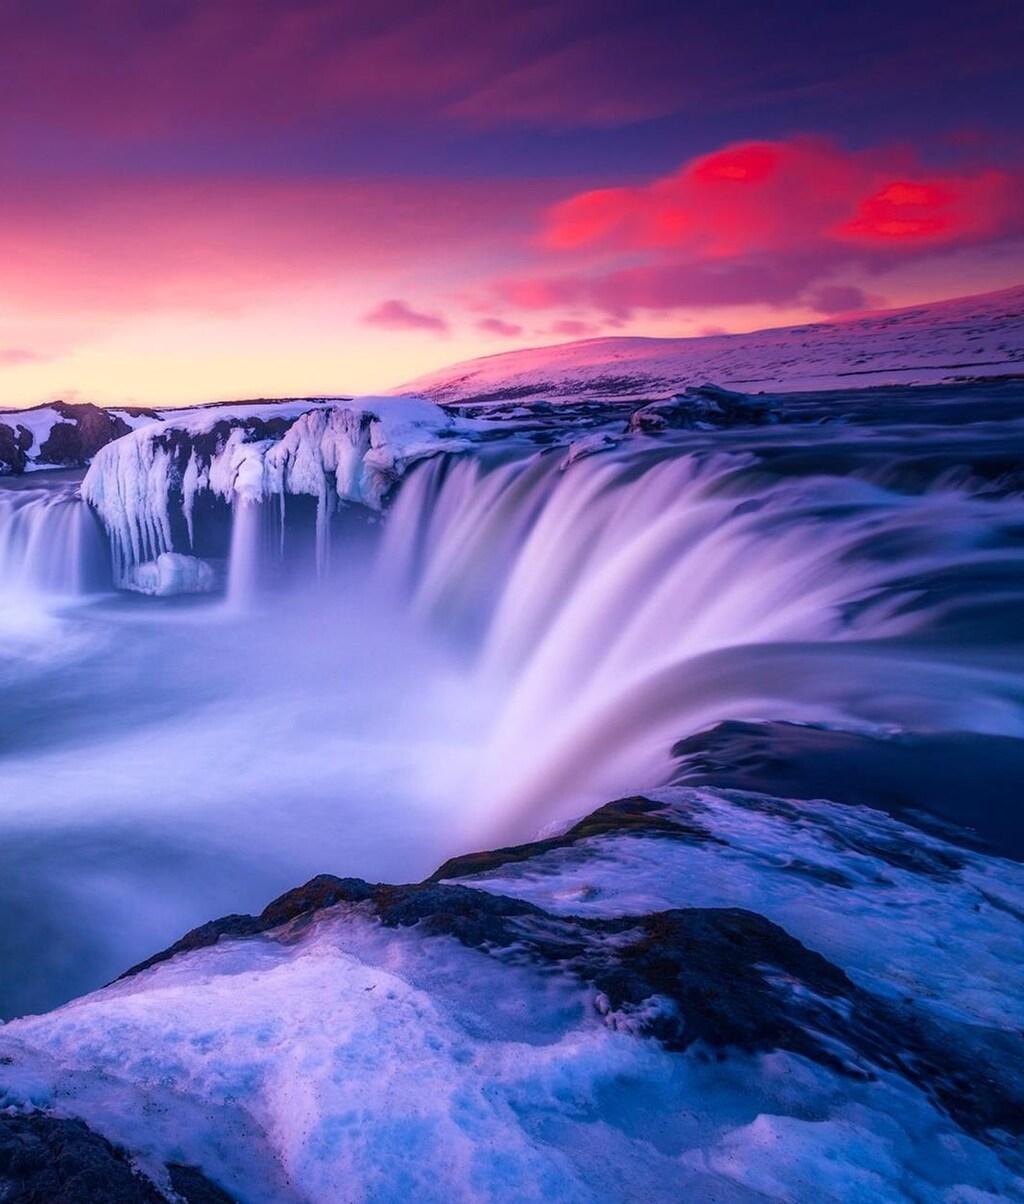 4k Resolution Wallpaper: Download Waterfall Iceland HD 4k Wallpapers In 1024x1204